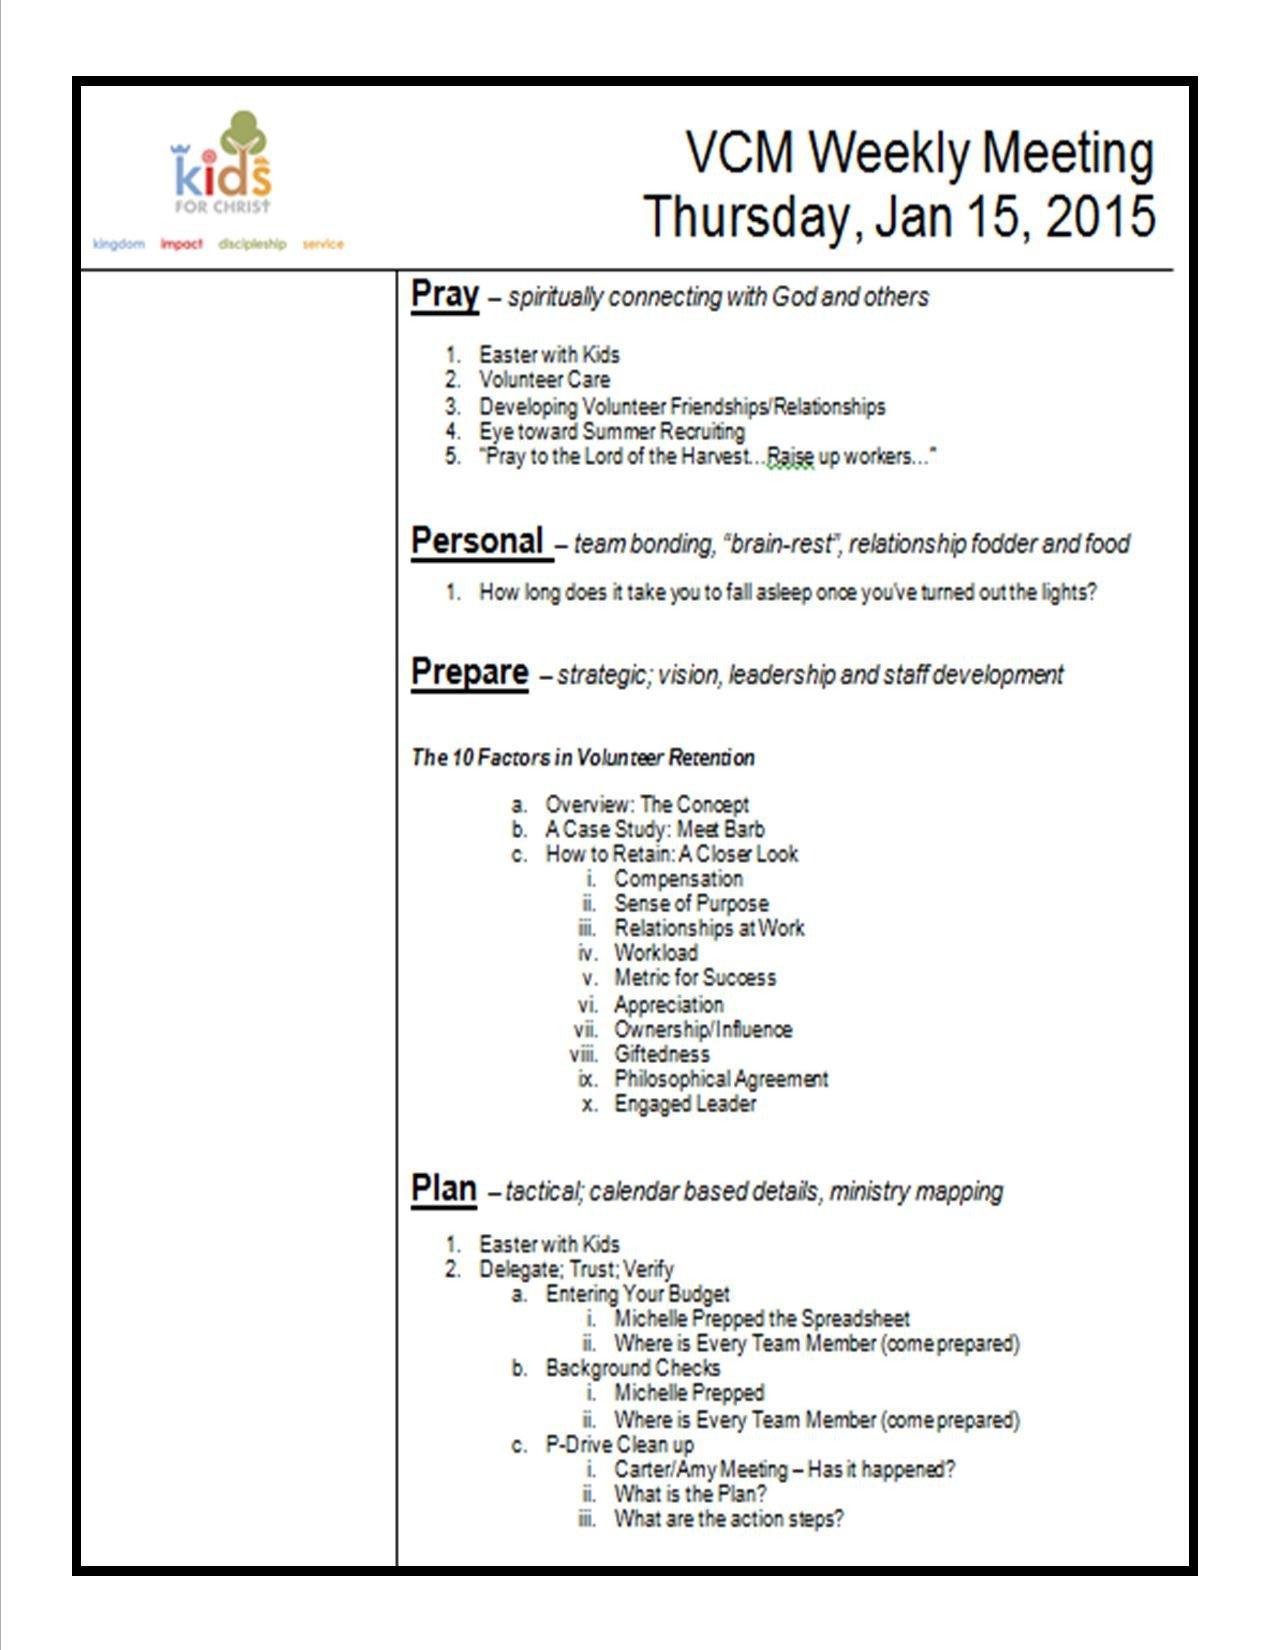 Church Staff Meeting Agenda Template How to Create A Meeting Agenda Kidminscience